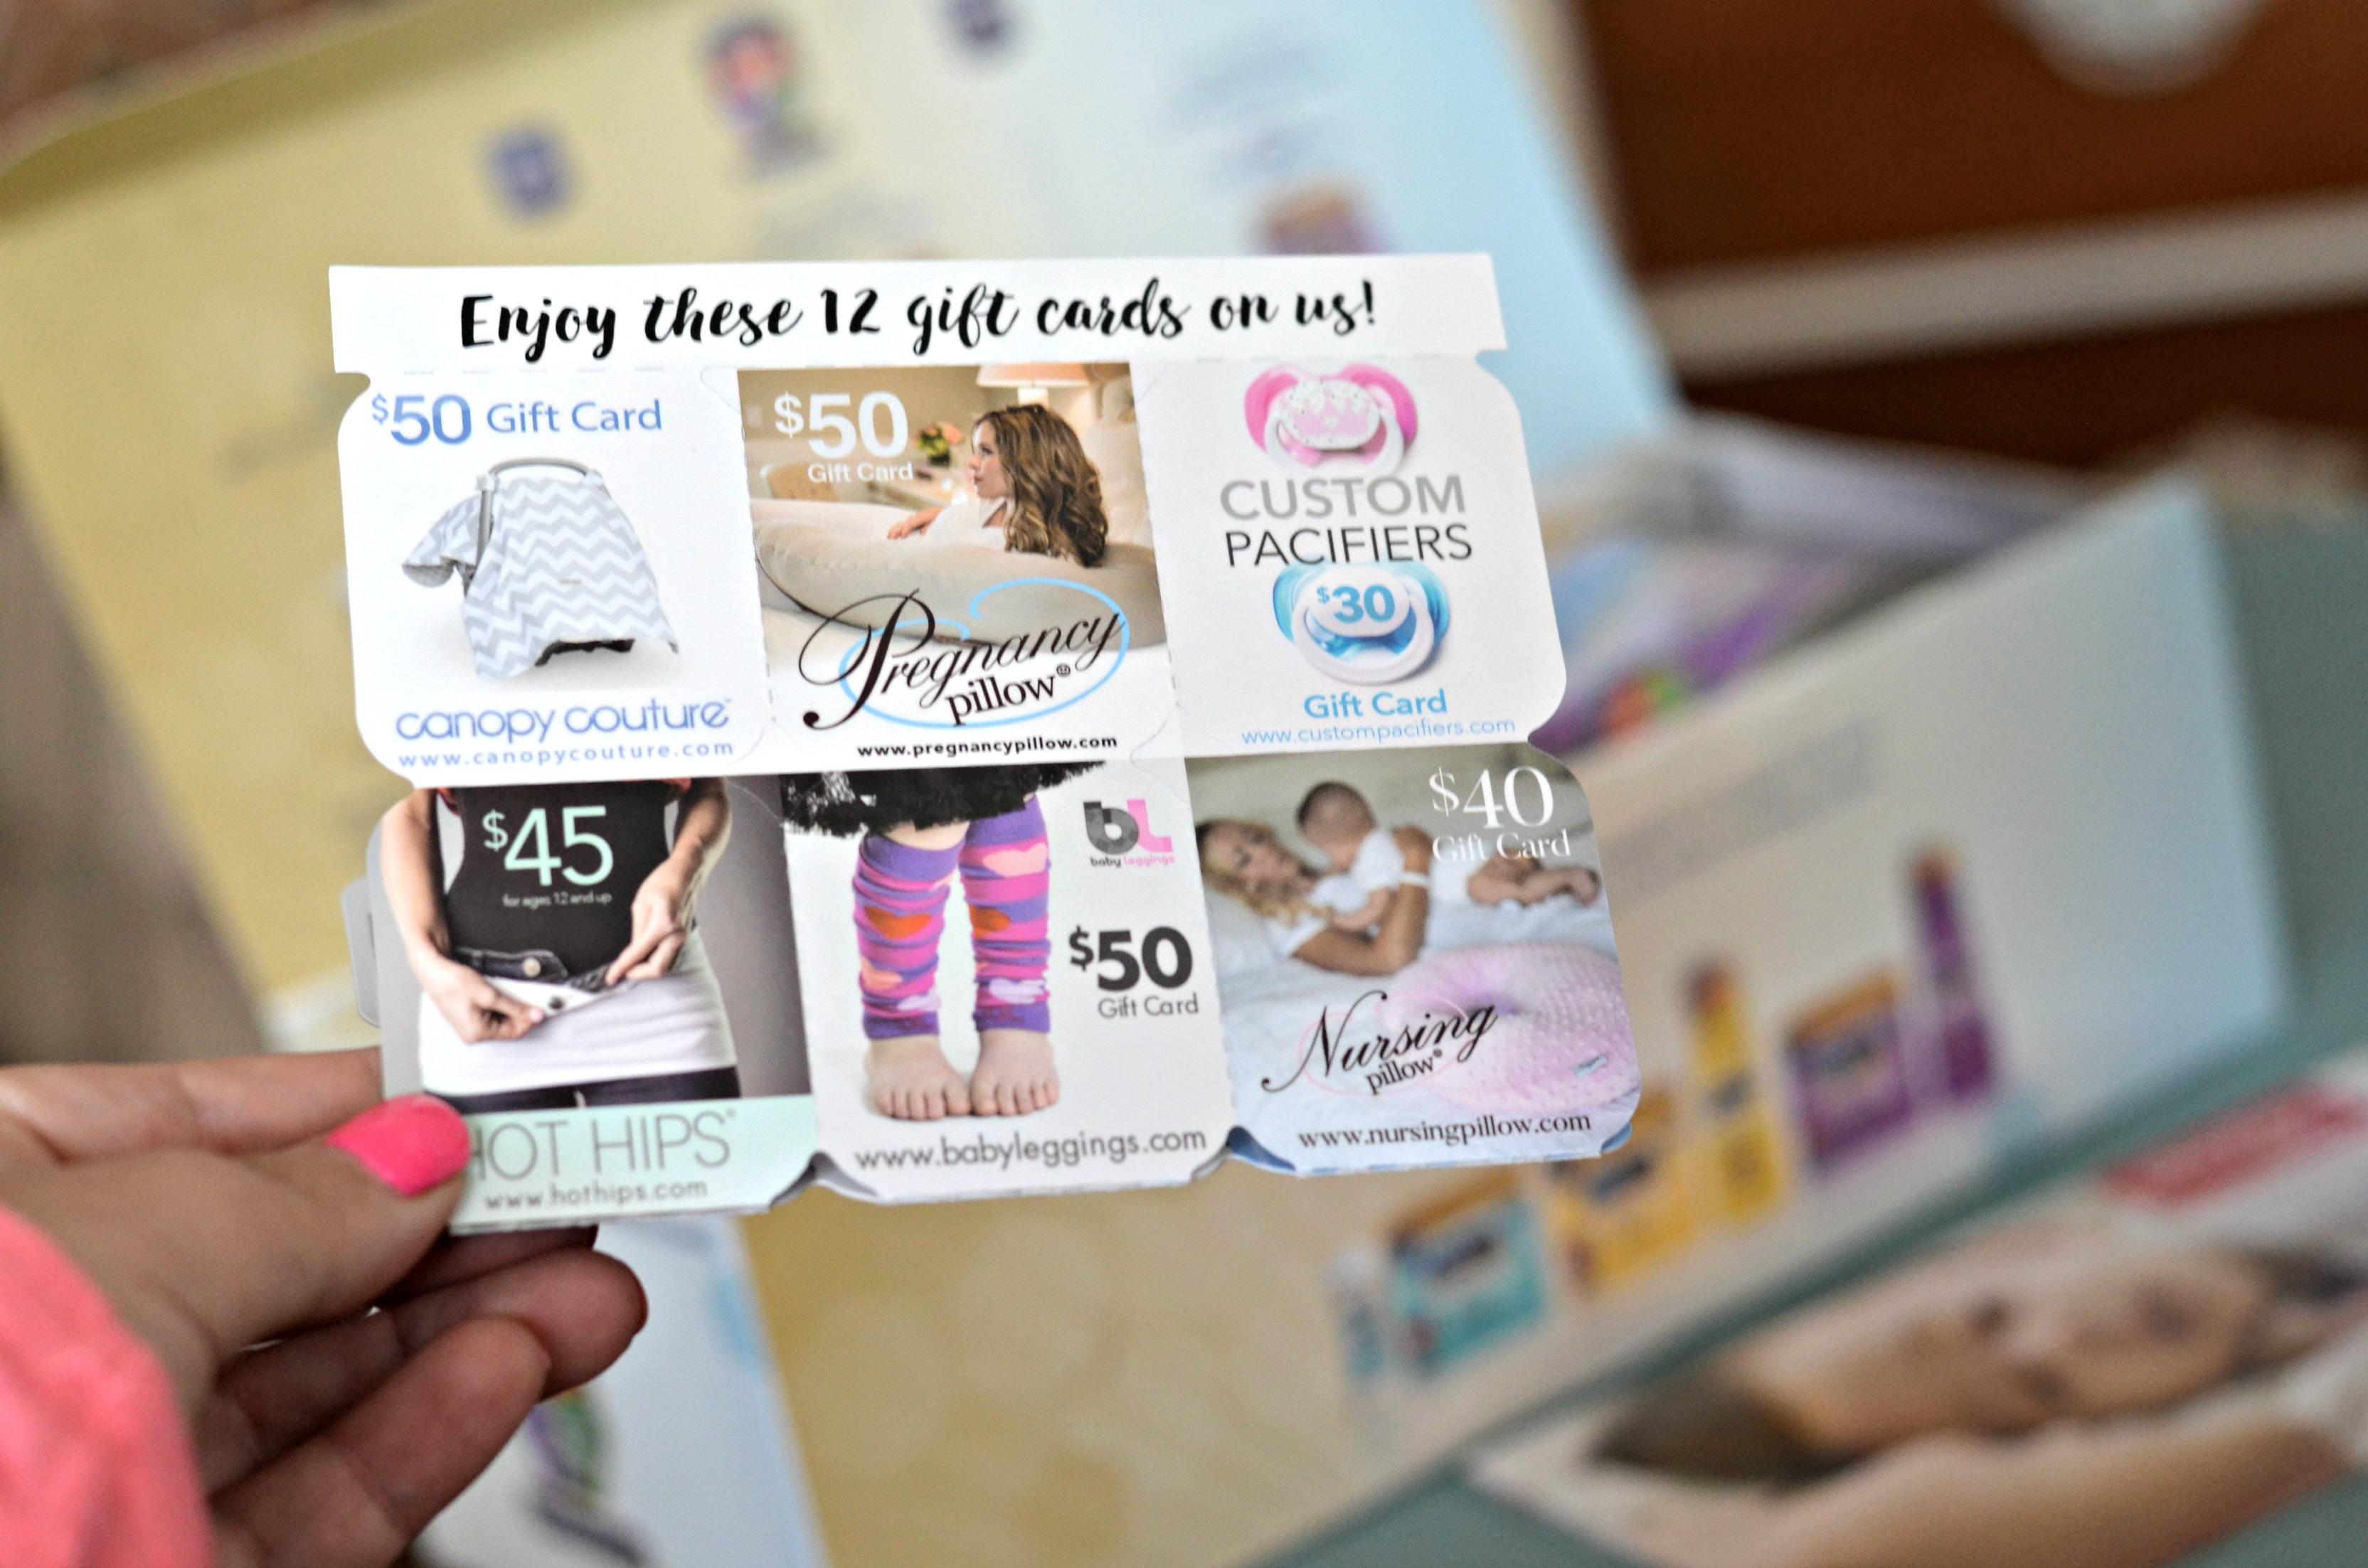 free enfamil baby box - get free enfamil gifts like these Enfamil gift cards